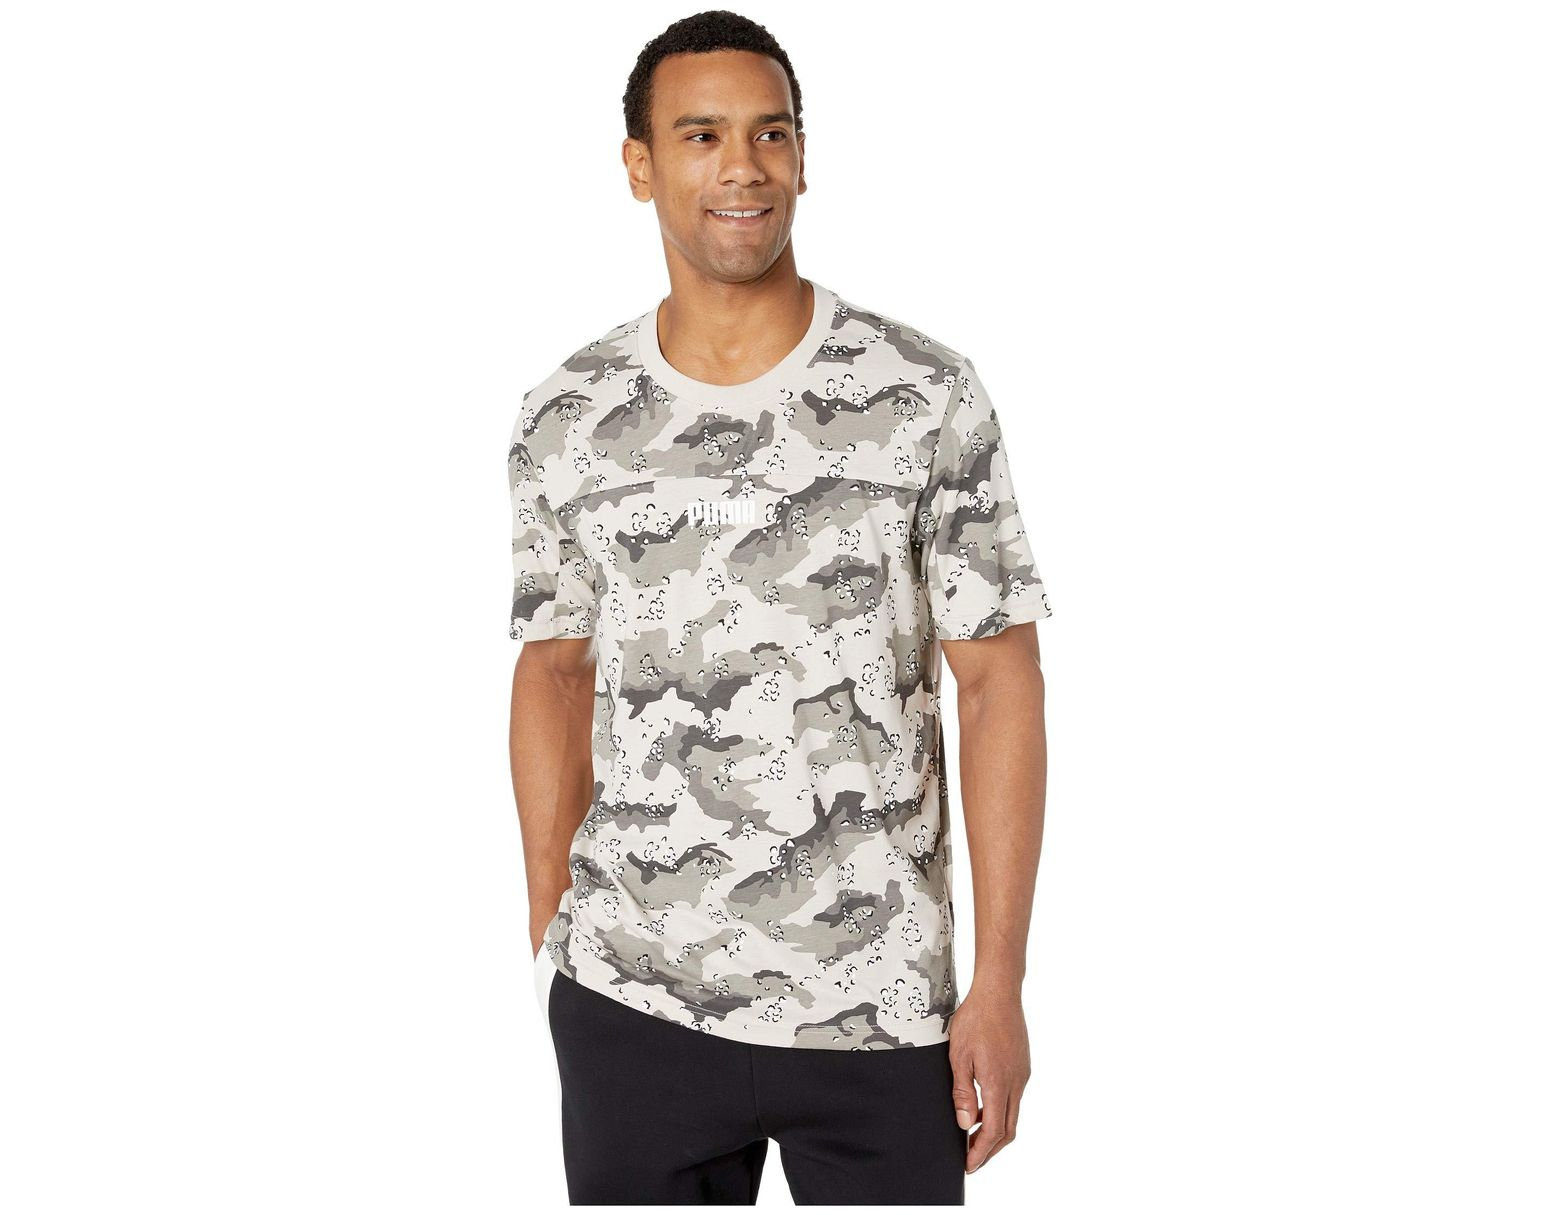 96c37d0c821 PUMA Wild Pack Aop Tee (silver Gray desert Aop) Men s T Shirt in Gray for  Men - Save 3% - Lyst